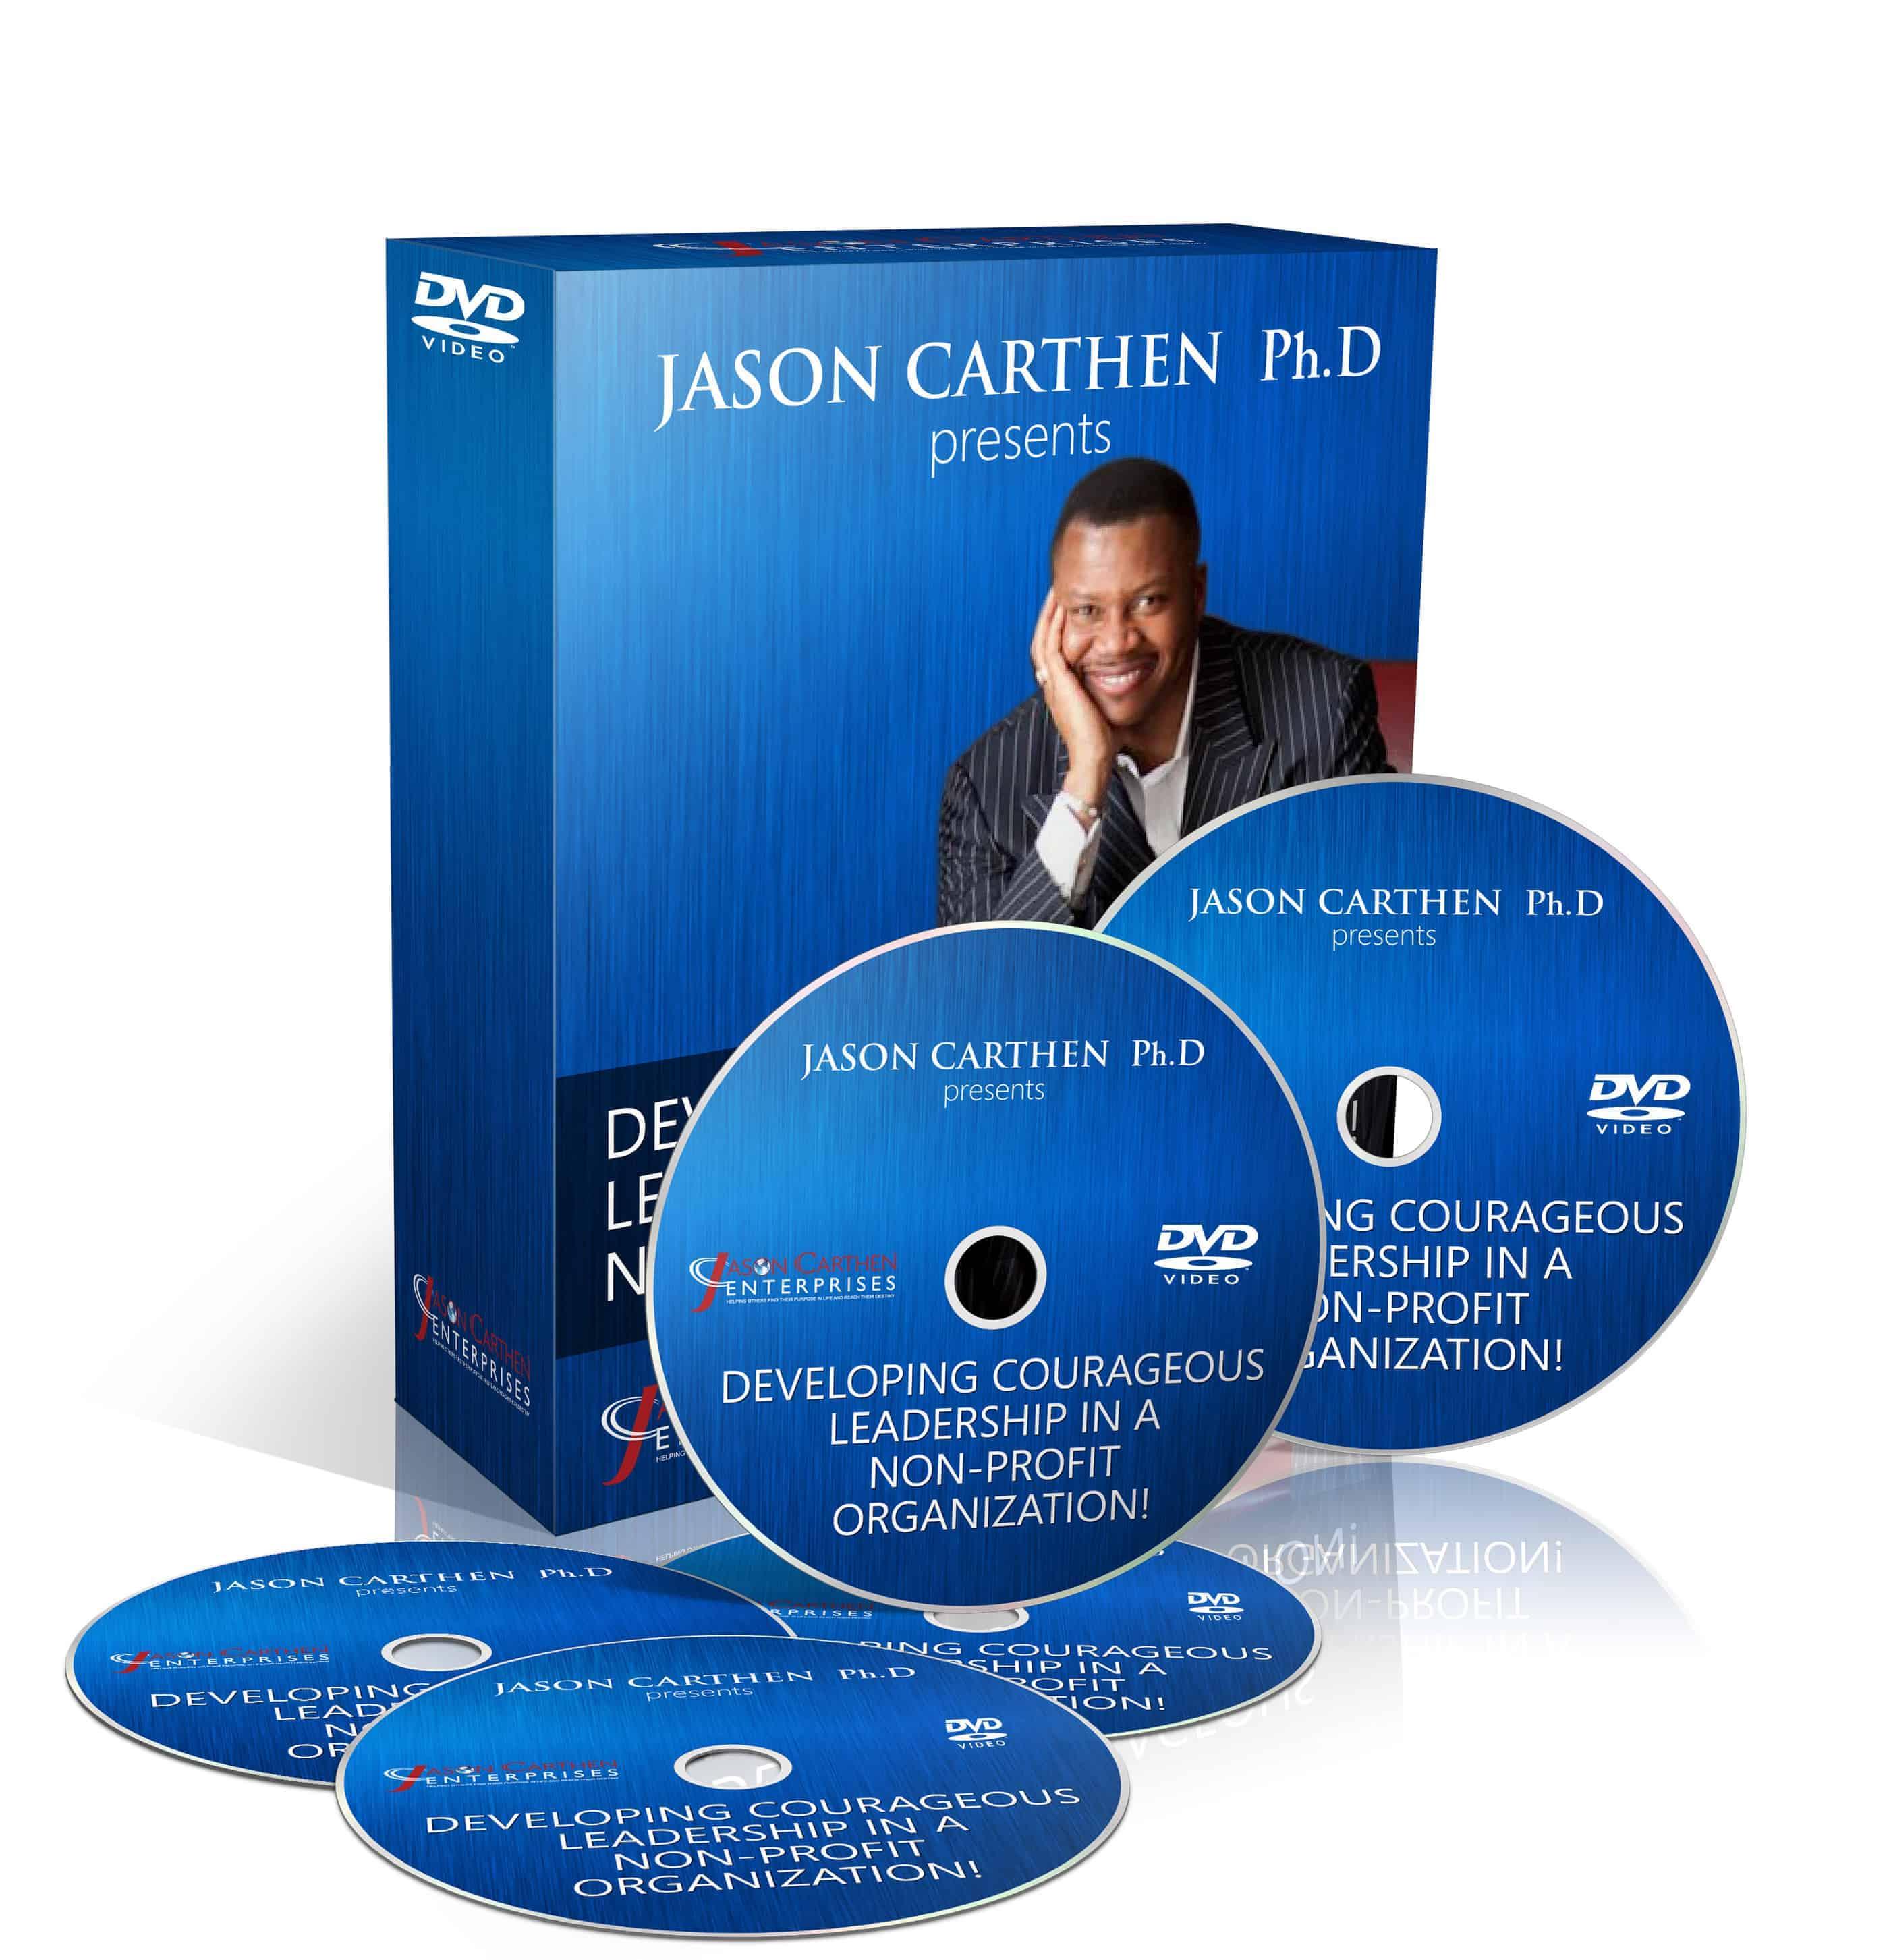 Dr. Jason Carthen: Developing Courageous Leadership